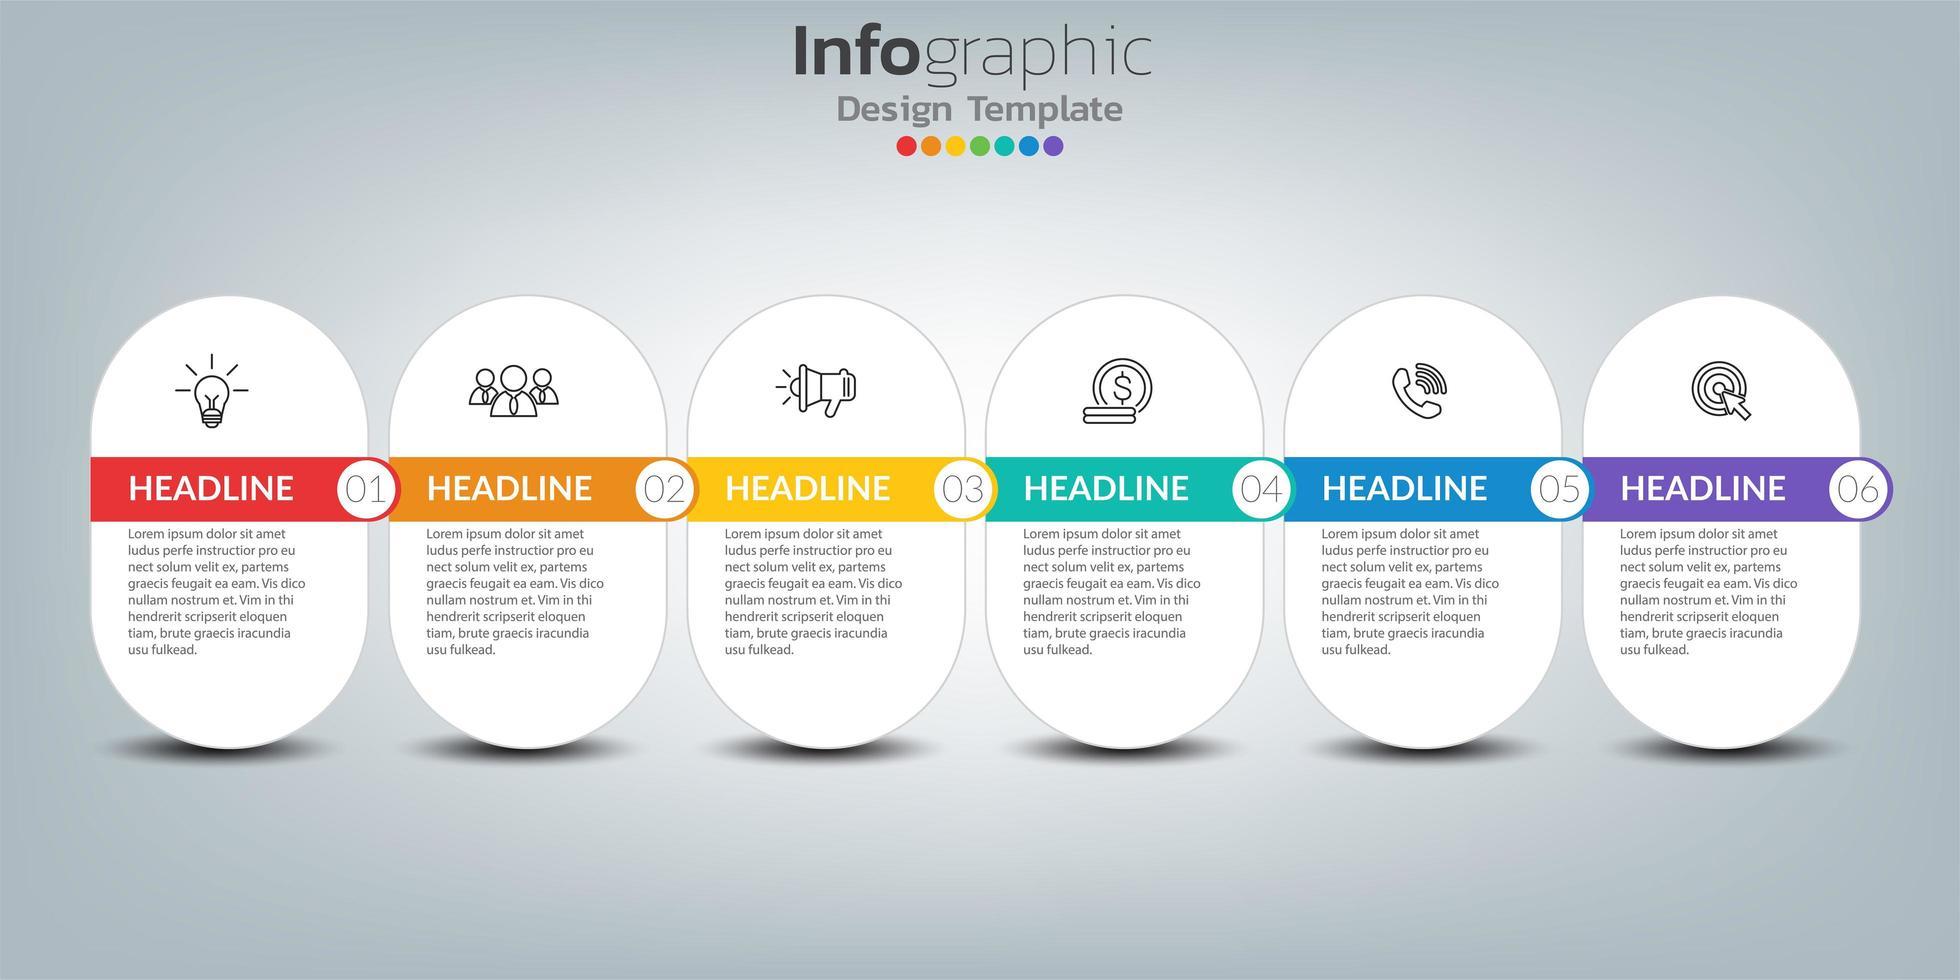 tidslinje infografisk mall med ikoner i framgångskoncept vektor